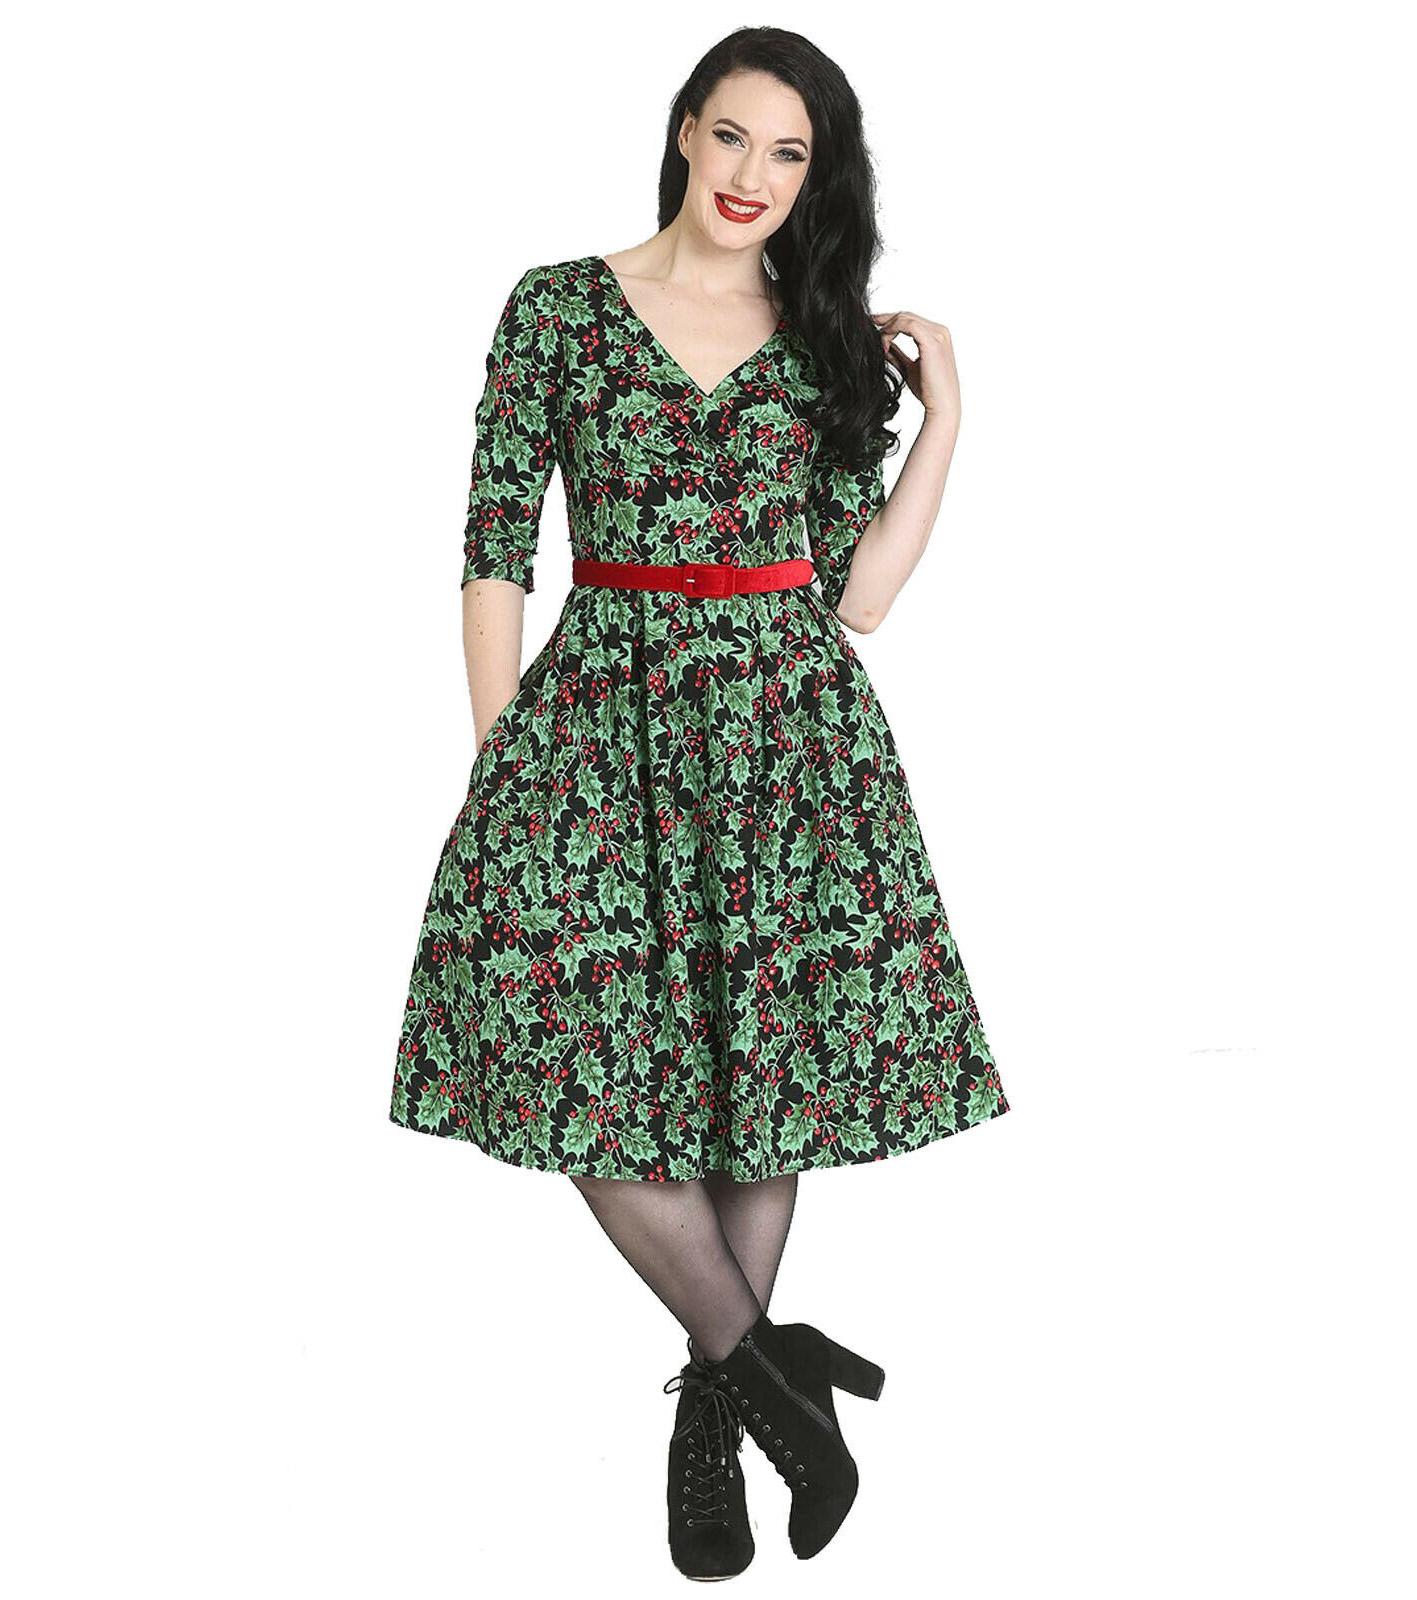 Hell-Bunny-50s-Pin-Up-Navidad-Vestido-Festivo-Rojo-Holly-Berry-Negro-Todos-los-Tamanos miniatura 27